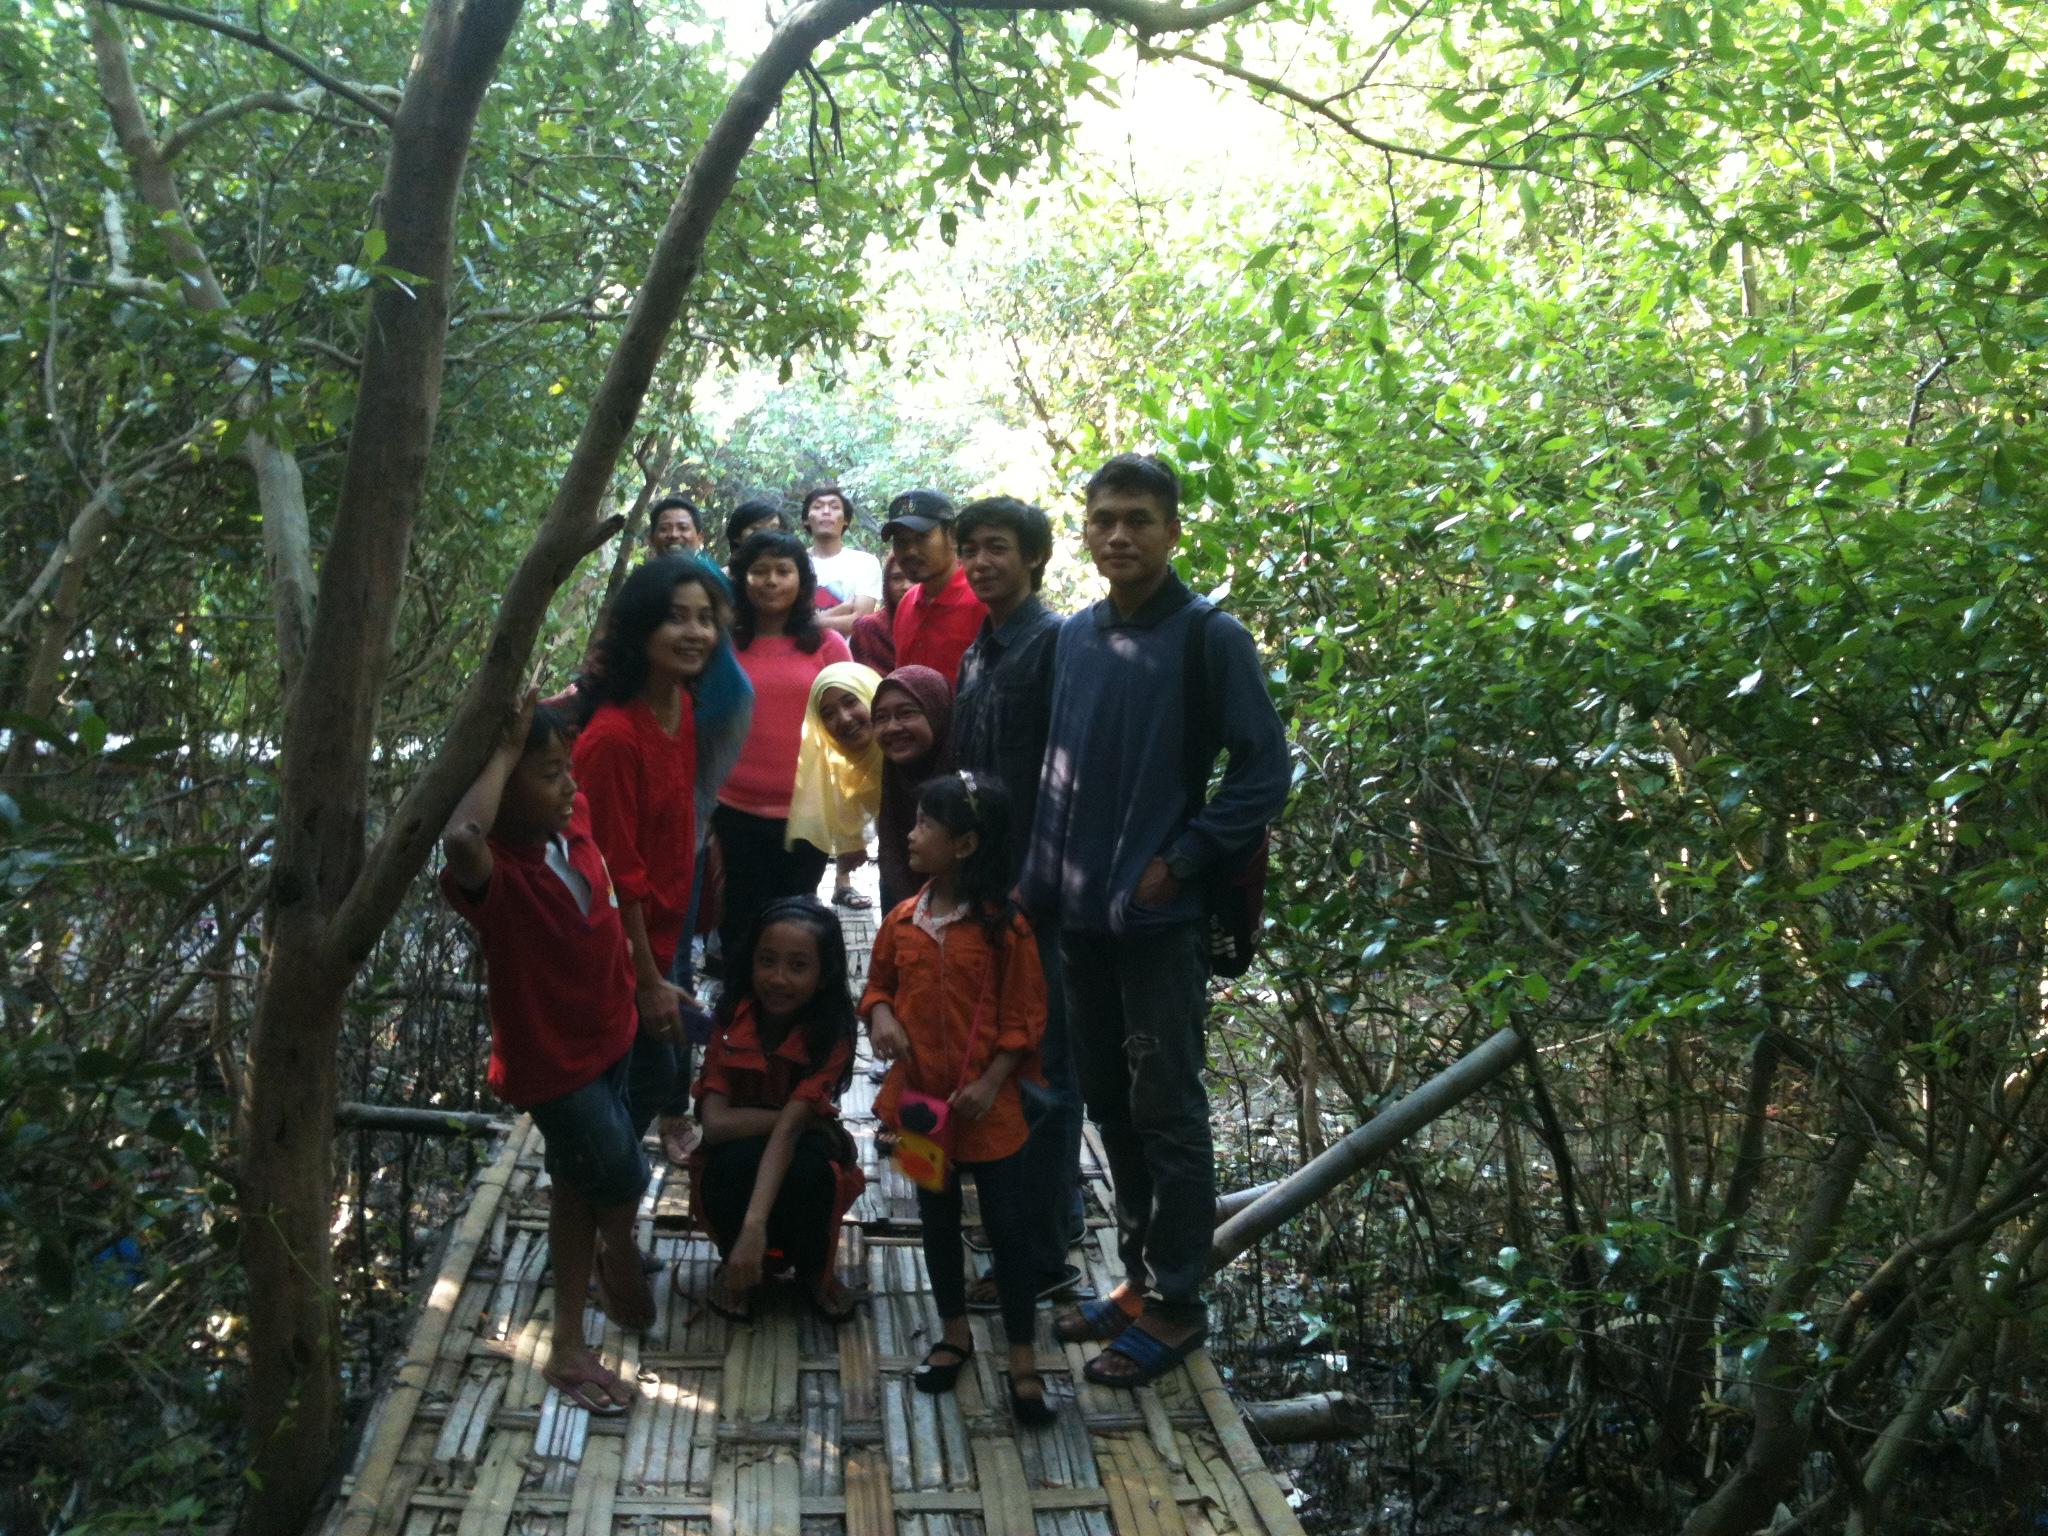 Tourism Ekowisata Mangrove Wonorejo Rungkut Maskakank Blog Suasana Hutan Bakau